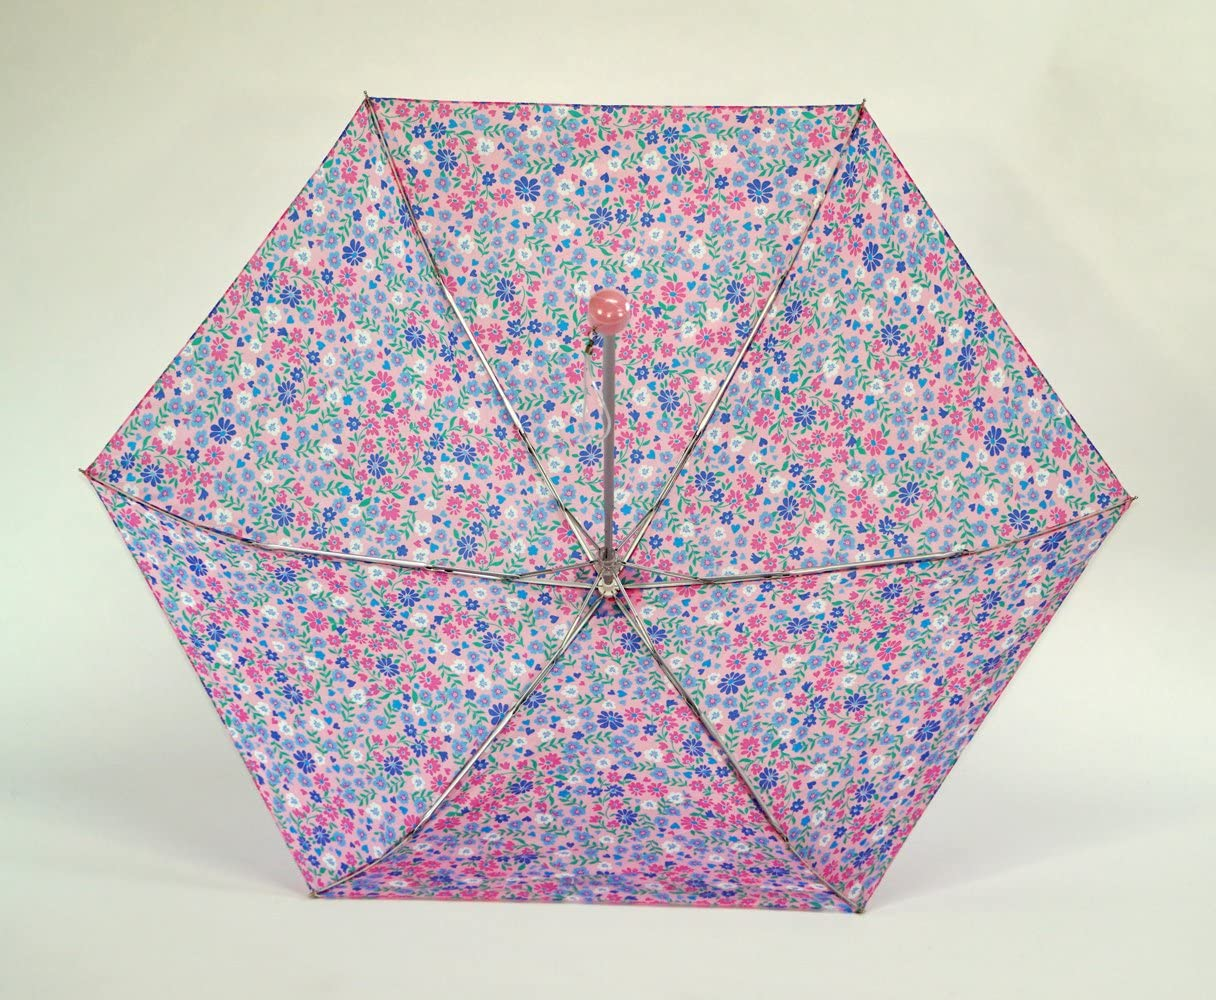 PADDING 2-in-1/Womens Folding Umbrella Master 50/cm Flower Field